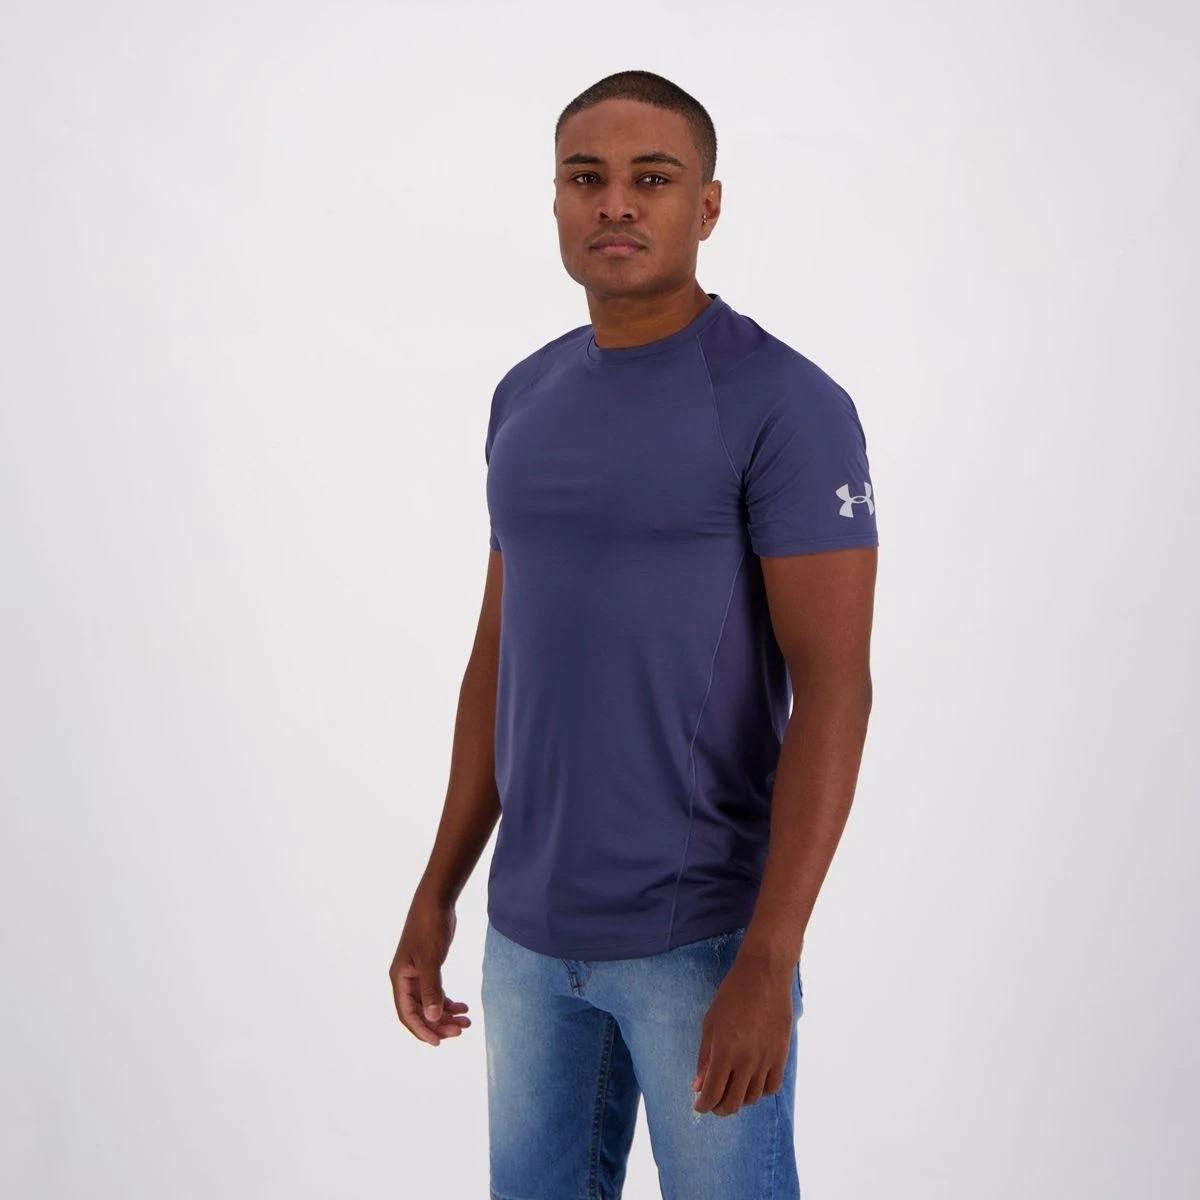 Camiseta Under Armour MK1 Tech 2.0